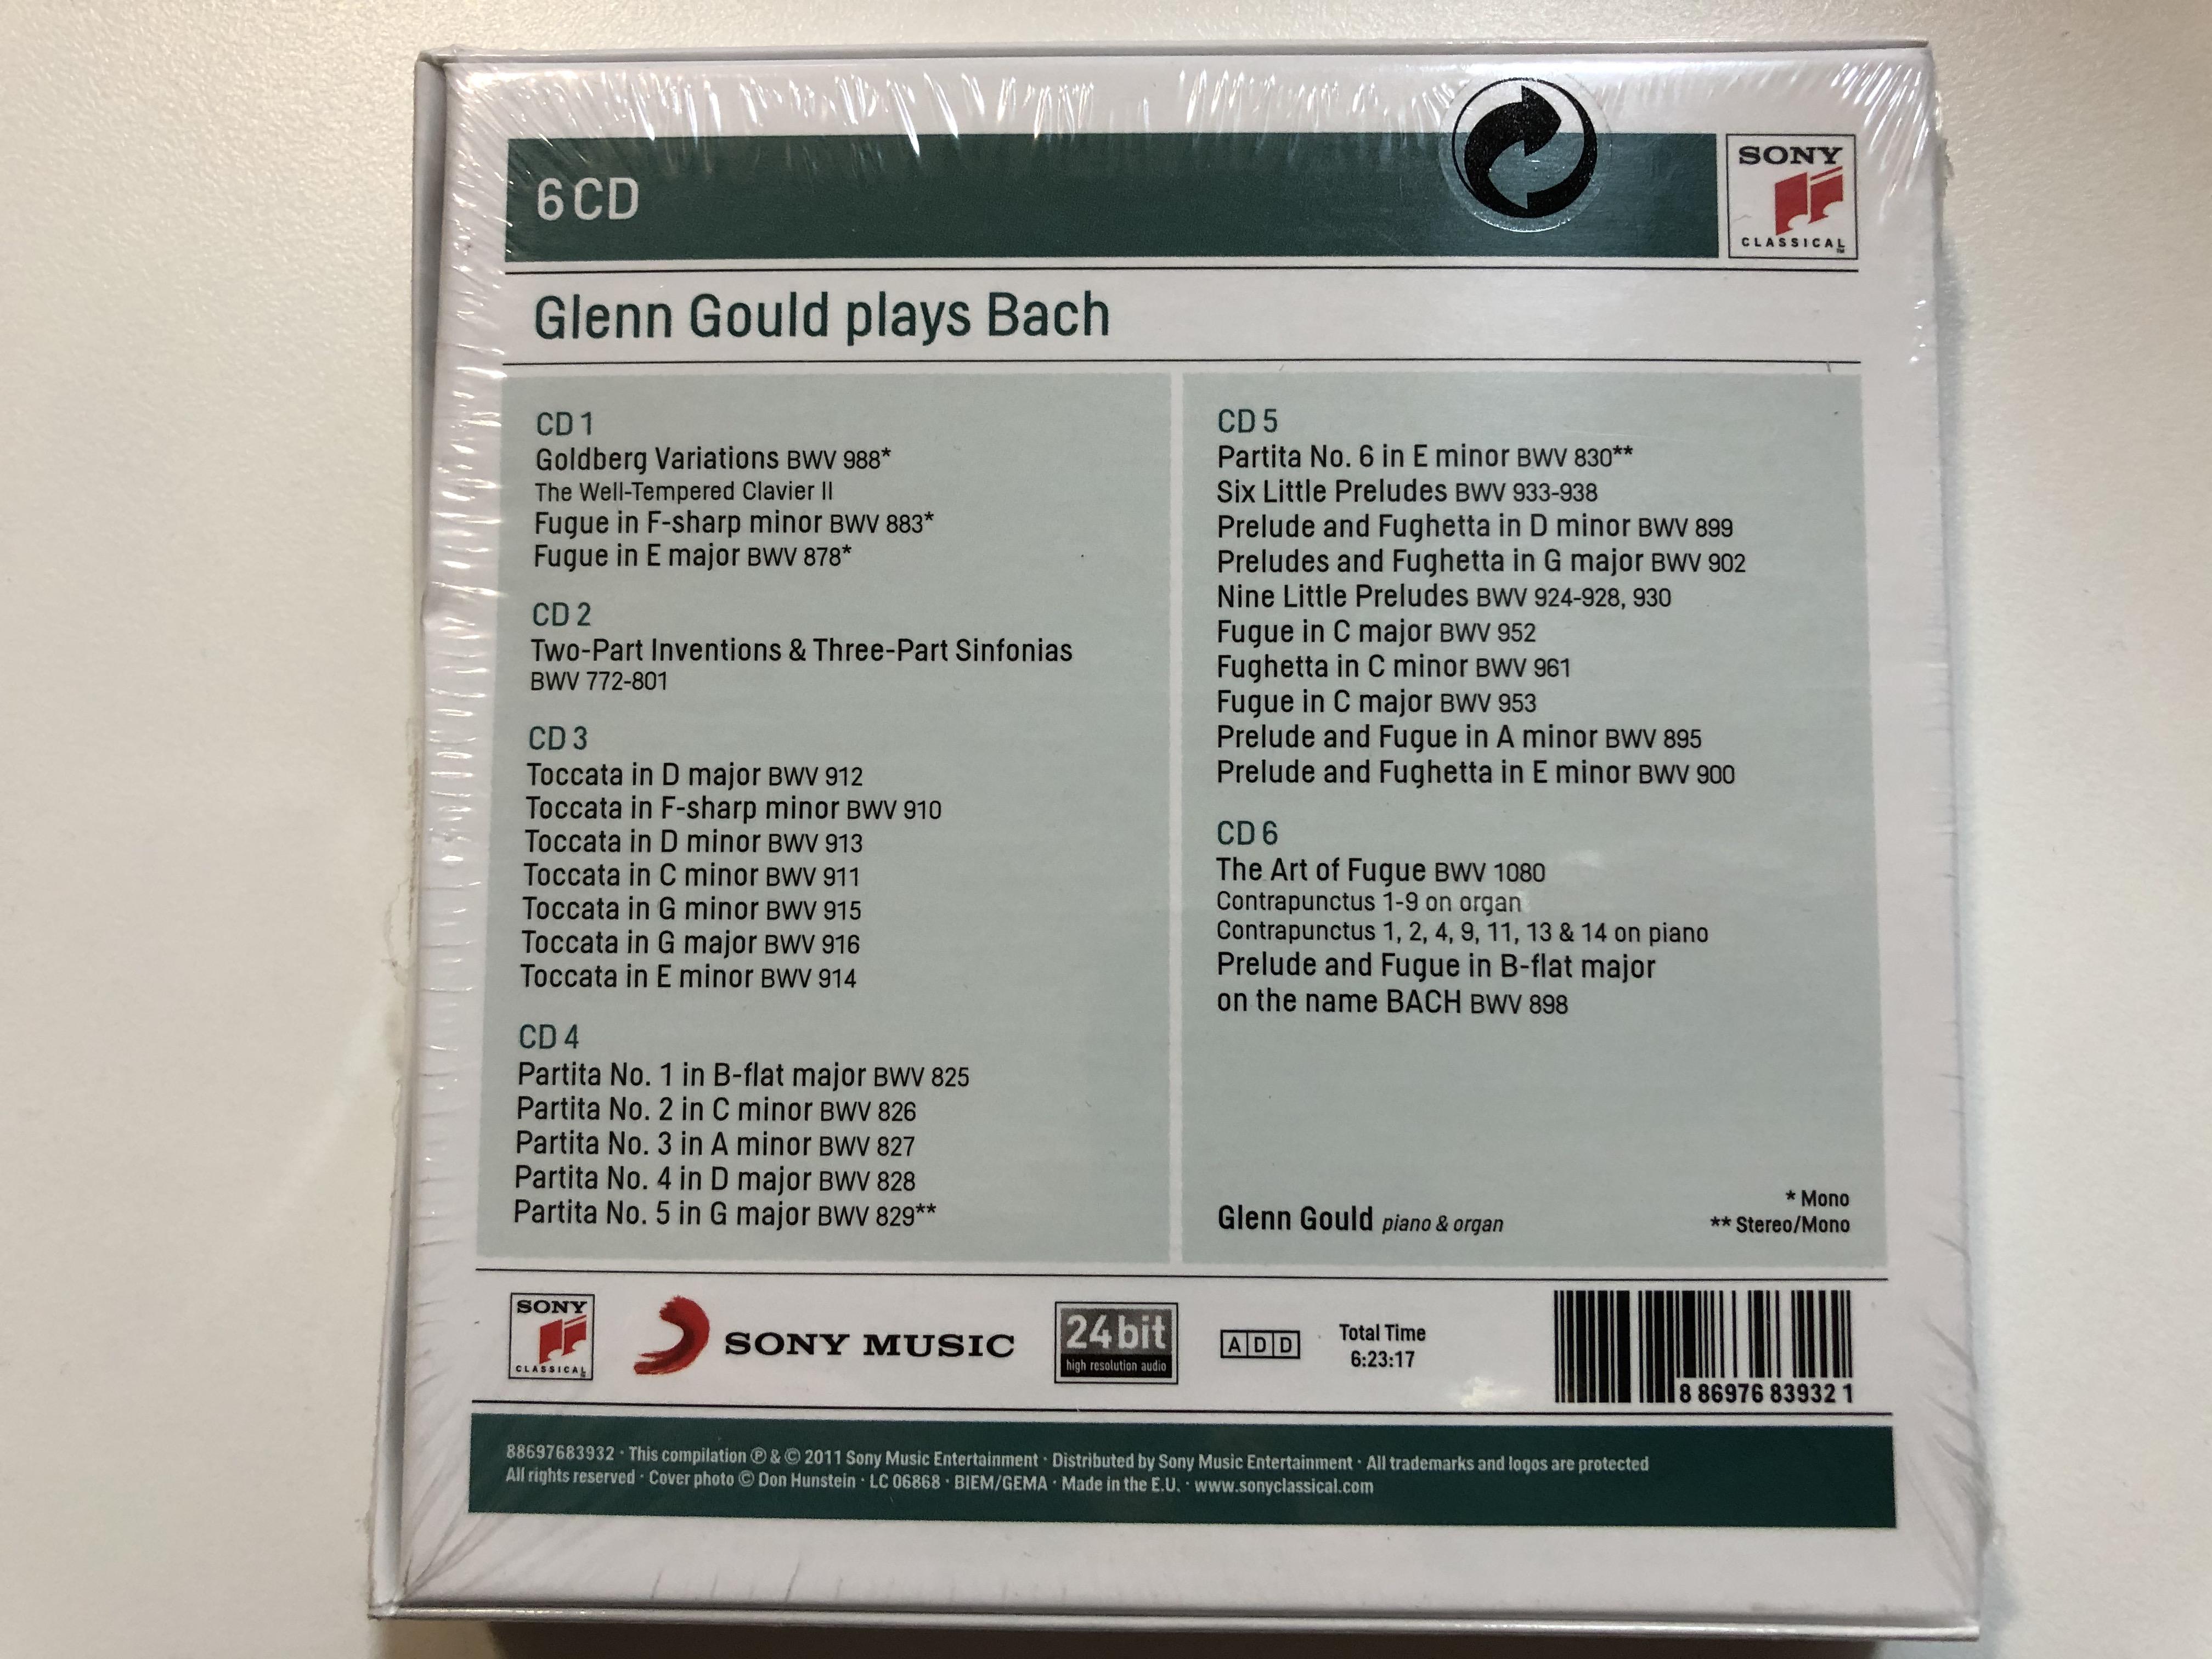 glenn-gould-plays-bach-goldberg-variations-inventions-toccatas-partitas-the-art-of-fugue-glenn-gould-piano-organ-sony-classical-6x-audio-cd-2011-stereo-mono-88697683932-2-.jpg